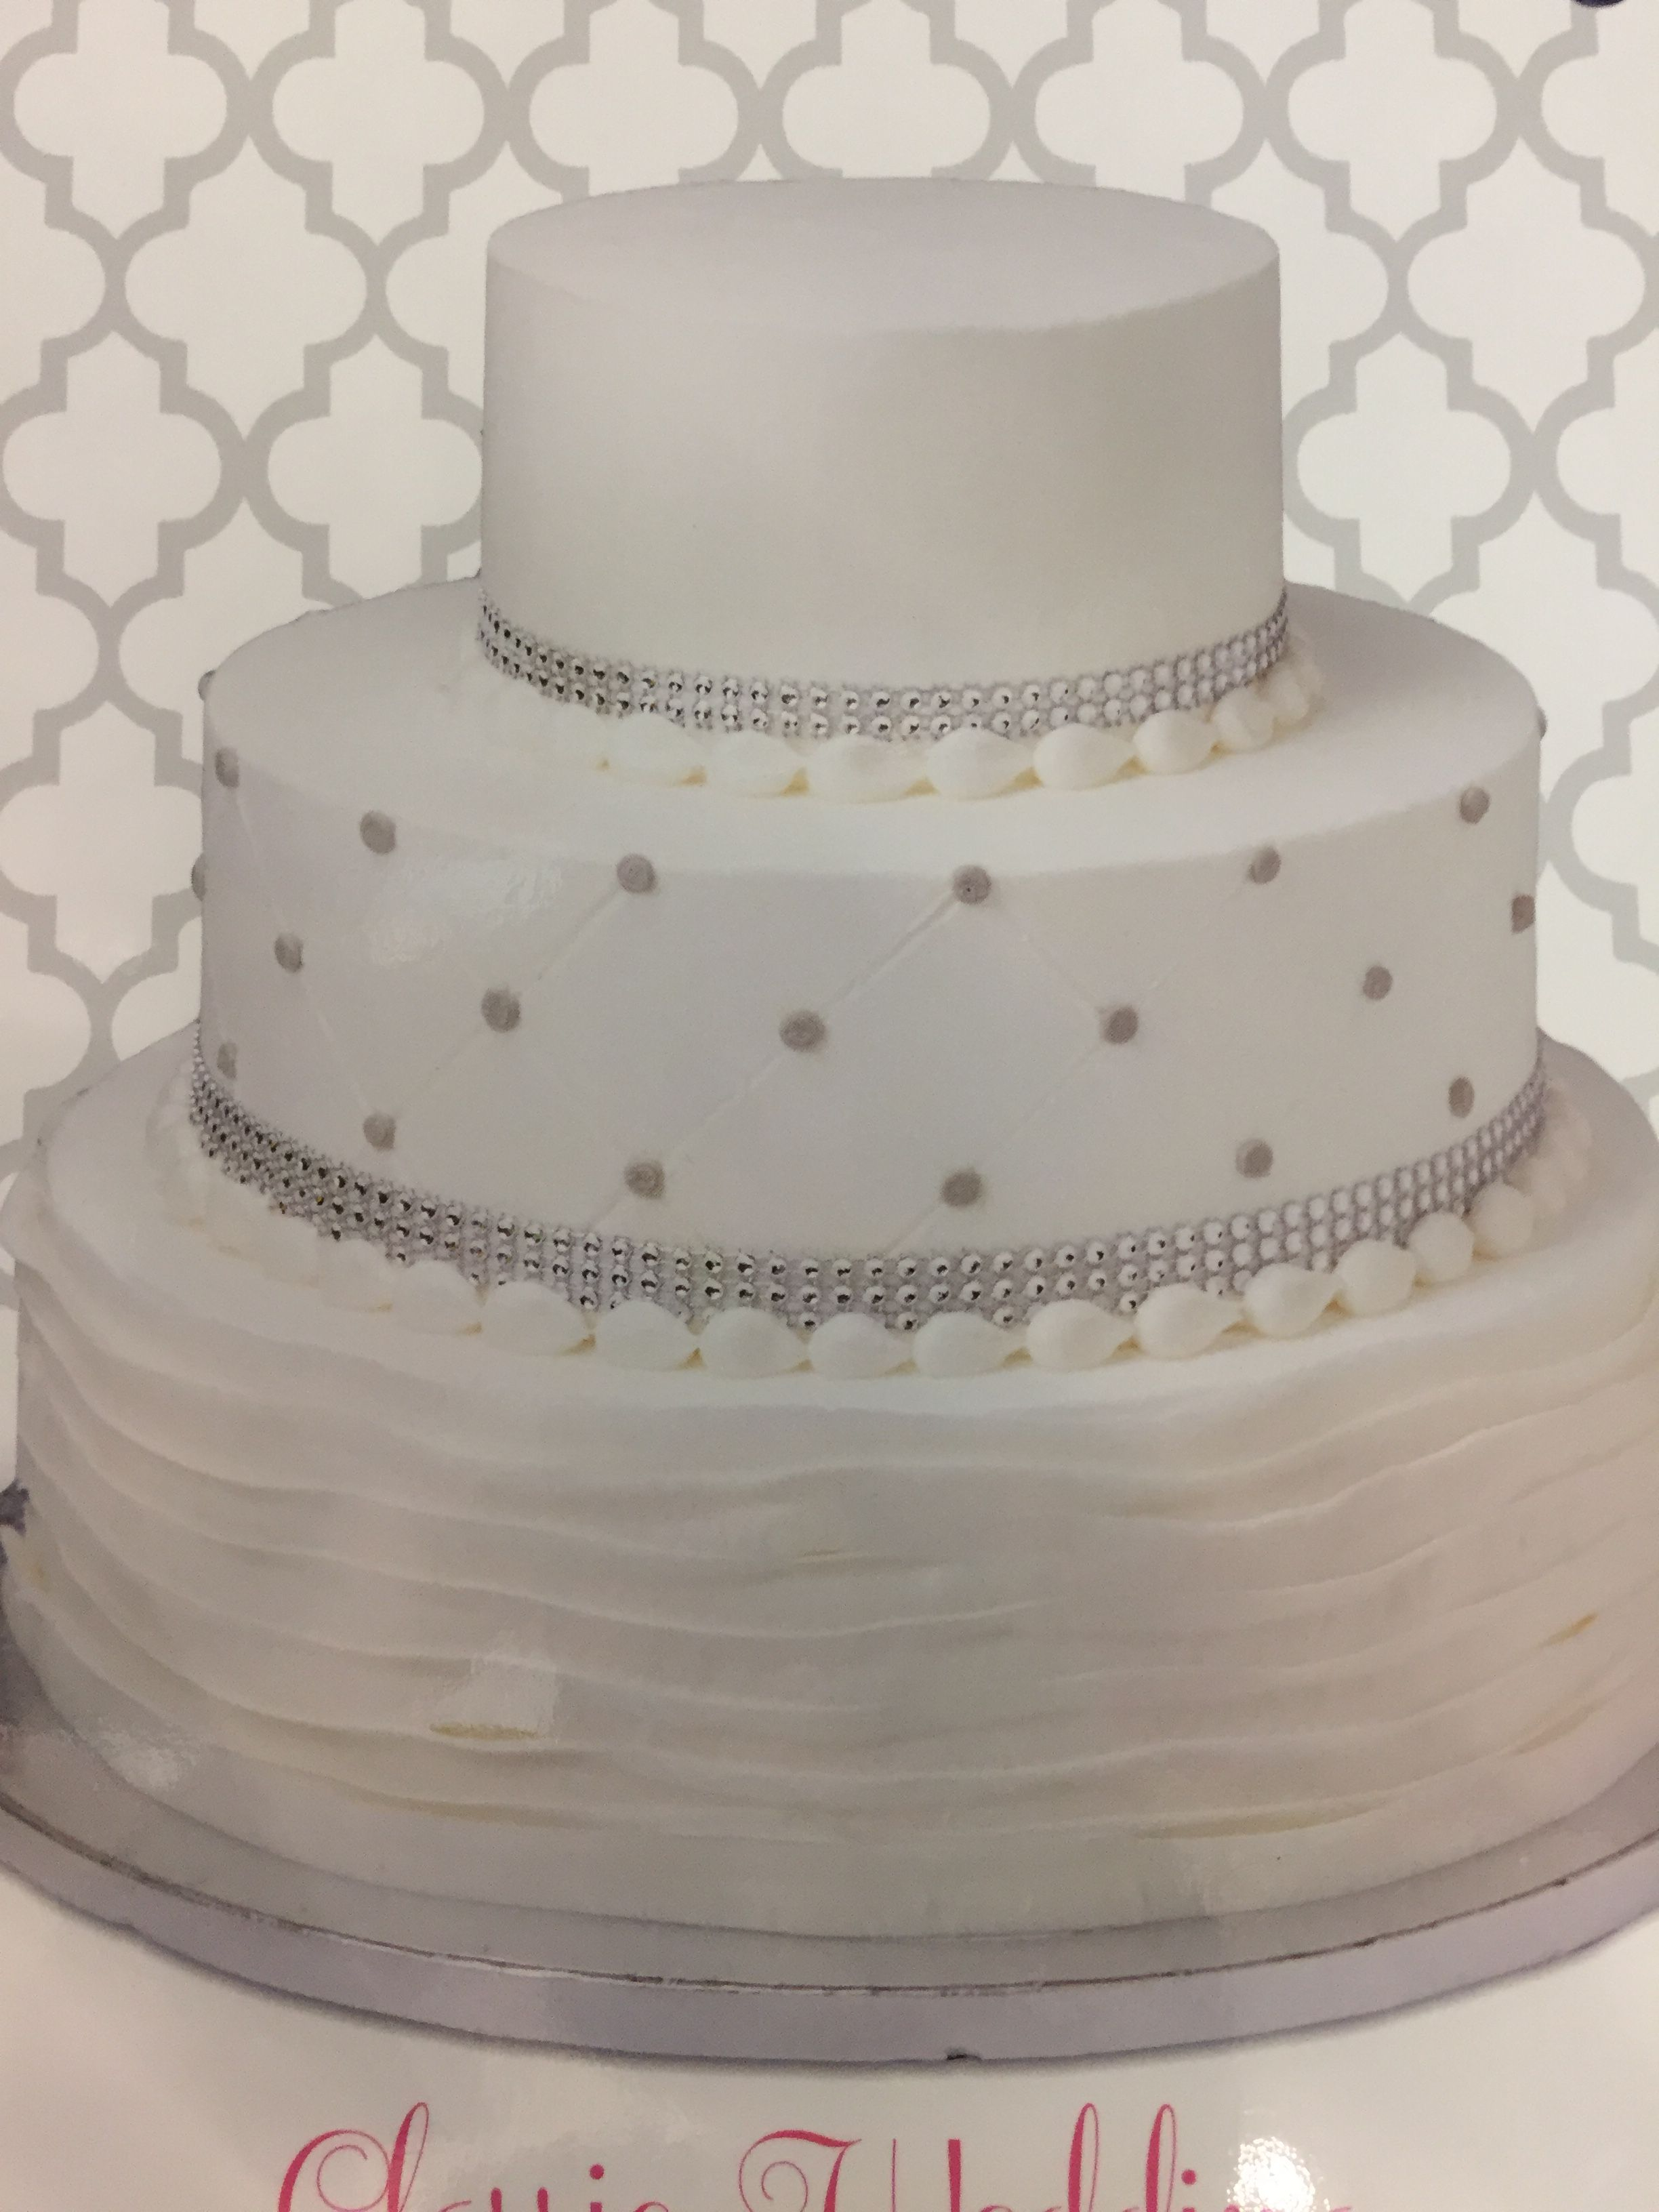 Walmart Cake From Their Book Walmart Wedding Cake Sams Club Wedding Cake Sams Club Cake